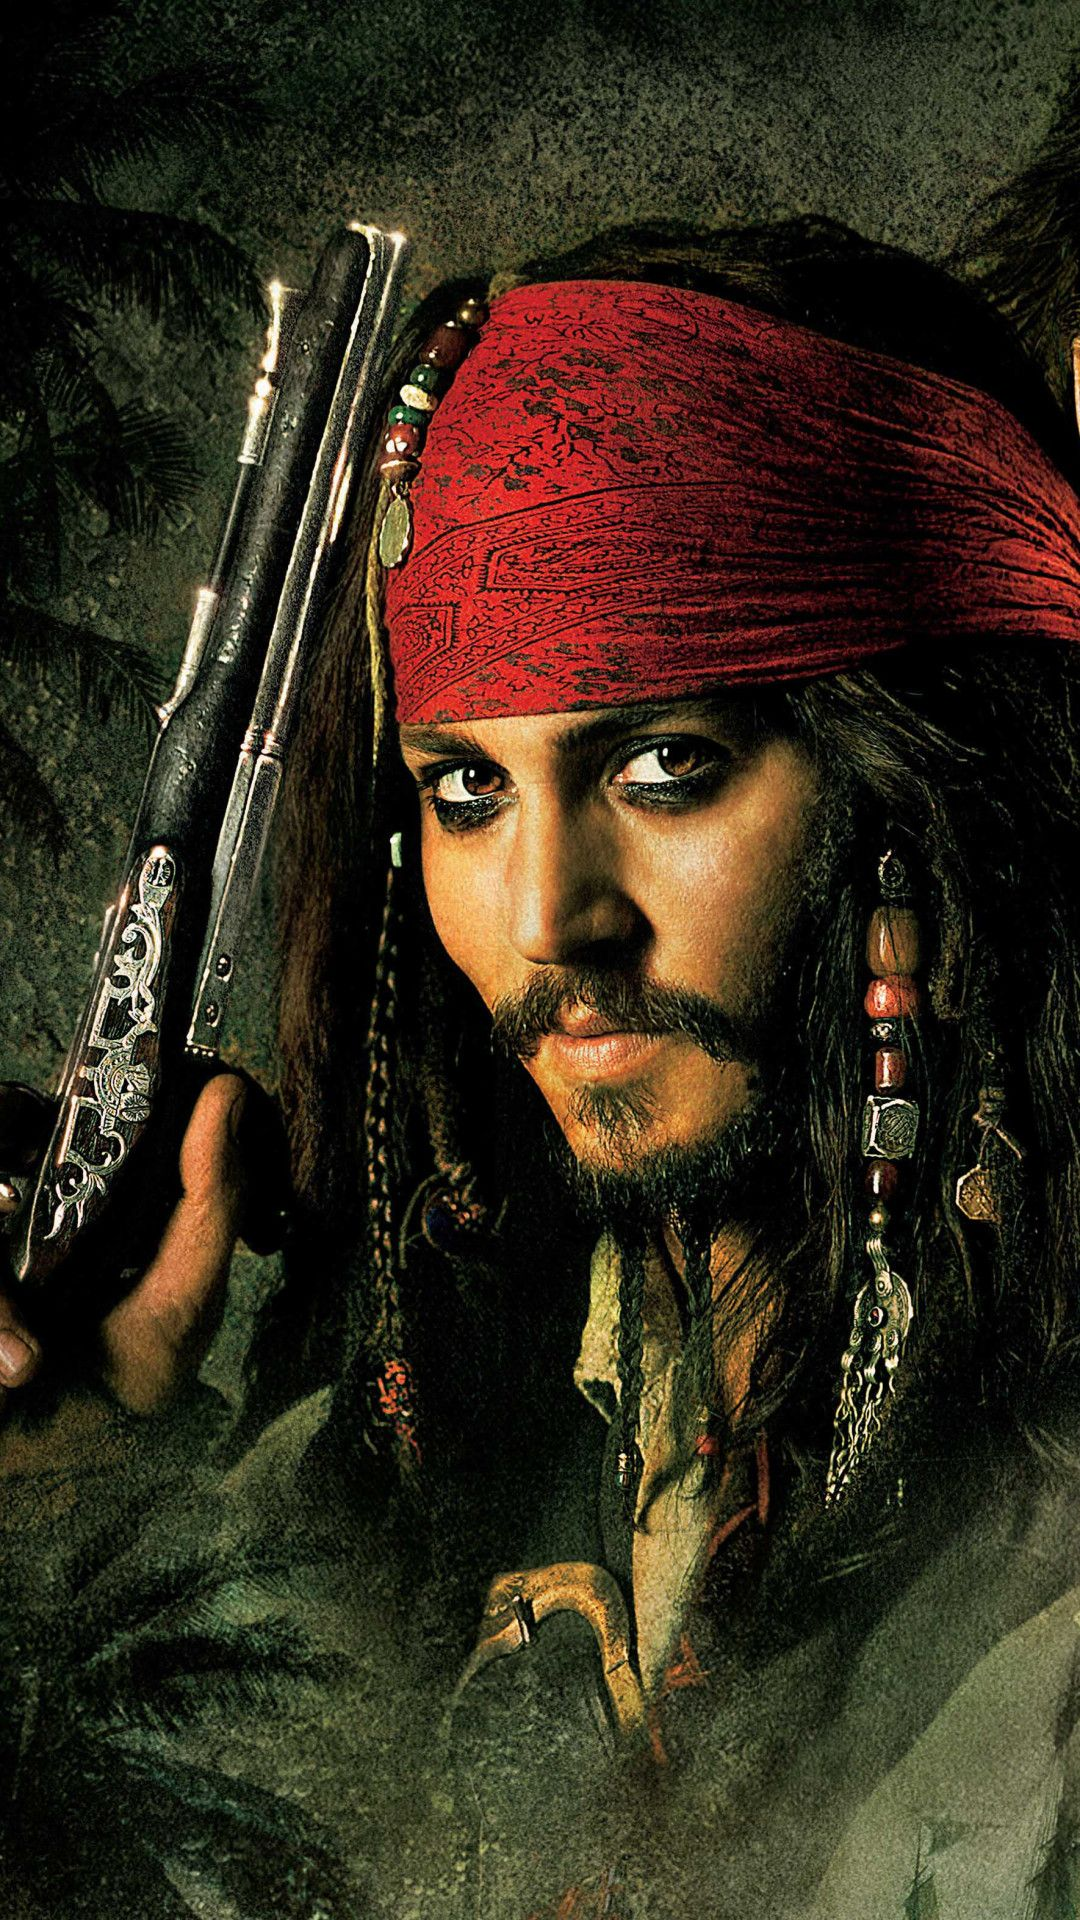 1080x1920 Wallpaper 617162 Jack Sparrow Wallpaper Pirates Of The Caribbean Jack Sparrow Tattoos Ultra hd hd 1080p jack sparrow wallpaper